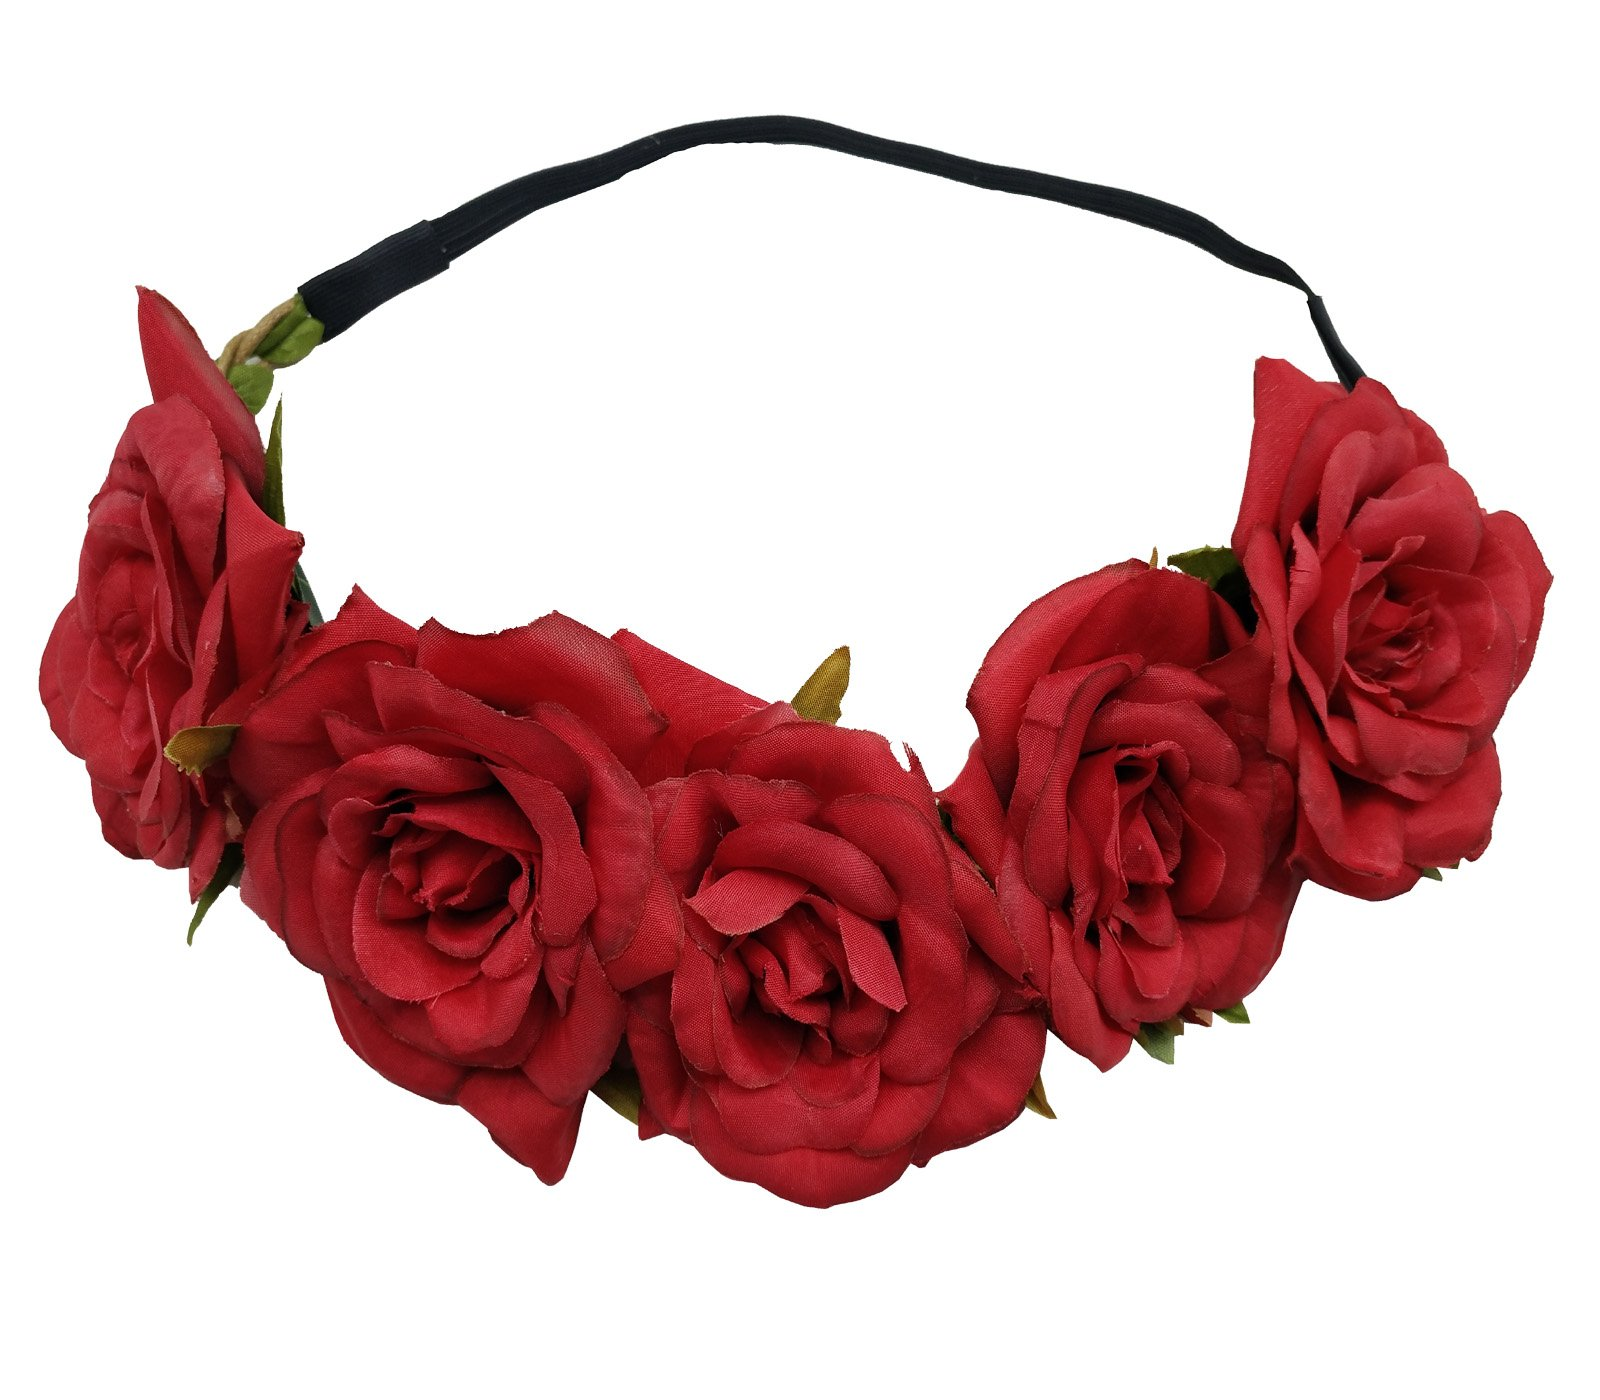 Amazon sanrich fake flower crowns headbands for women girl sanrich fake flower crowns headbands for women girl rose floral head piece maternity photoshoot realistic hair izmirmasajfo